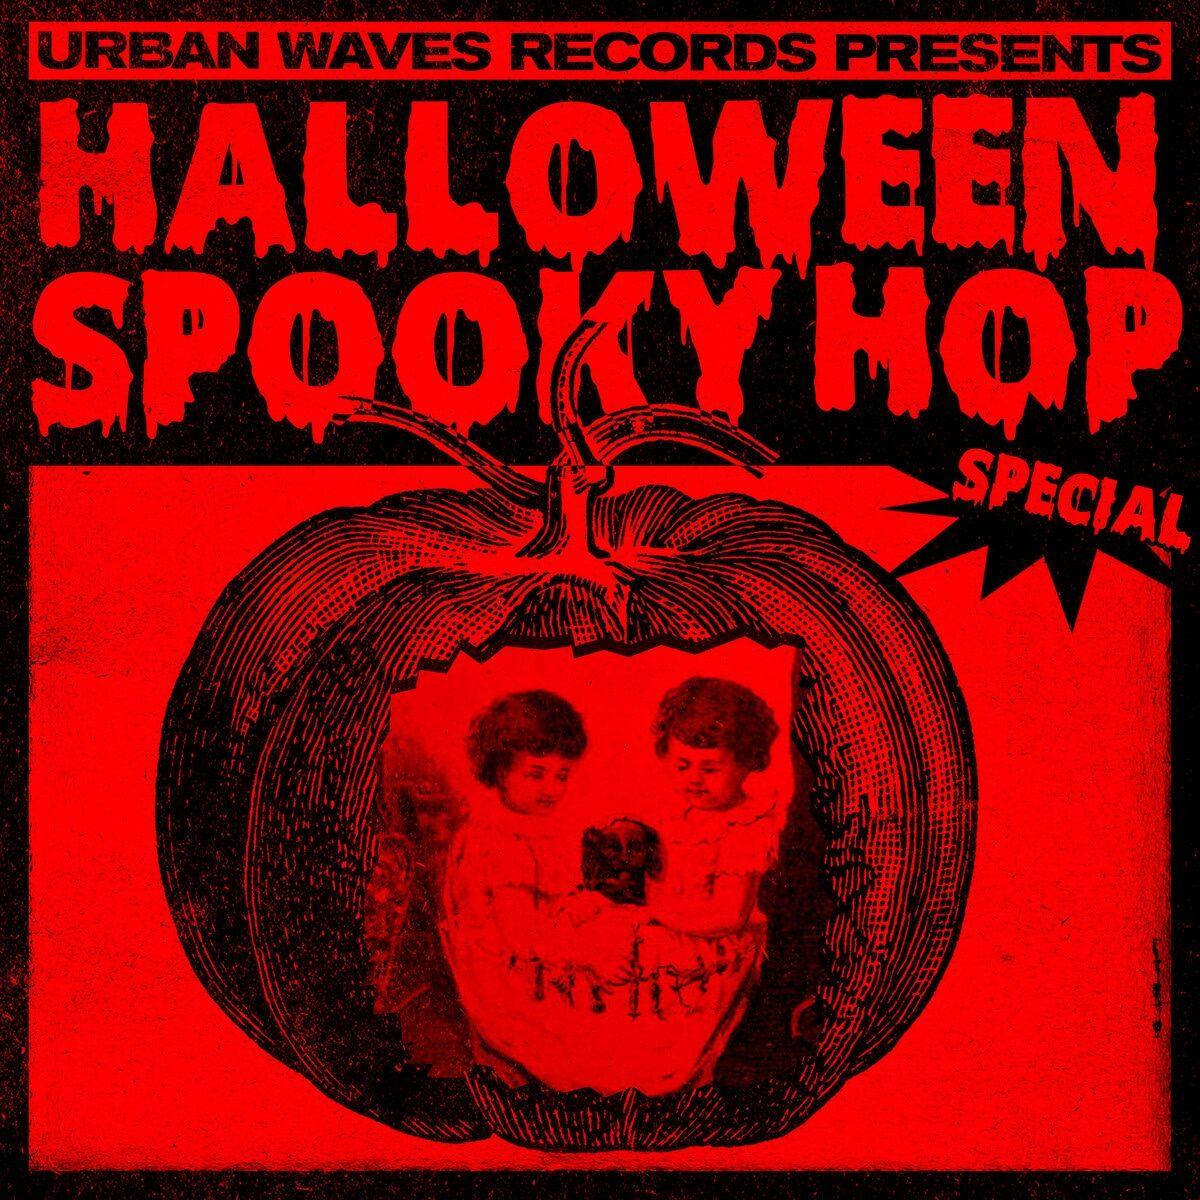 Halloween Spooky Hop Special